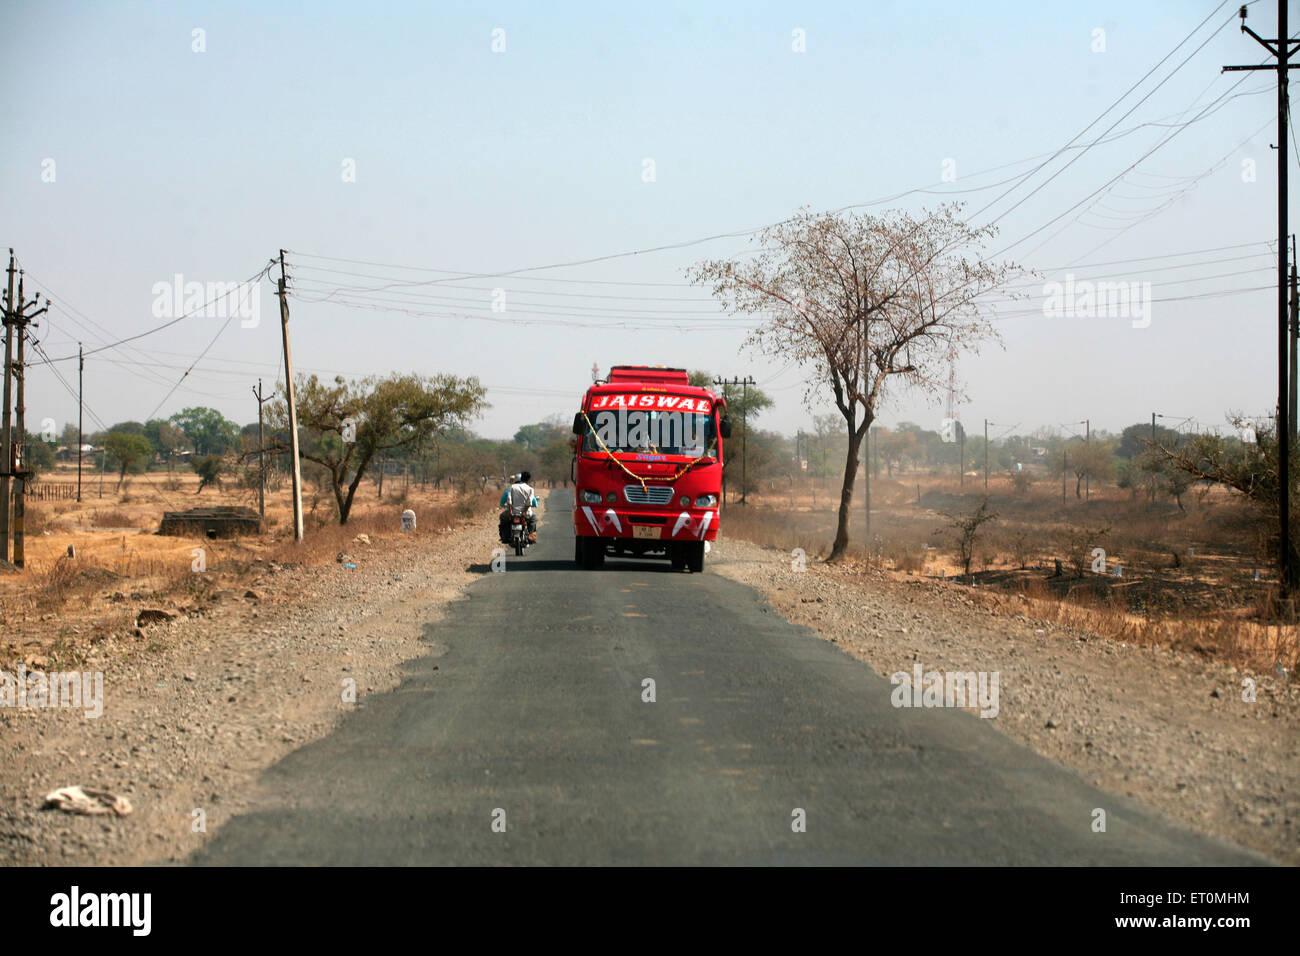 Tourist bus plying on Bhopal highway in Madhya Pradesh ; India - Stock Image